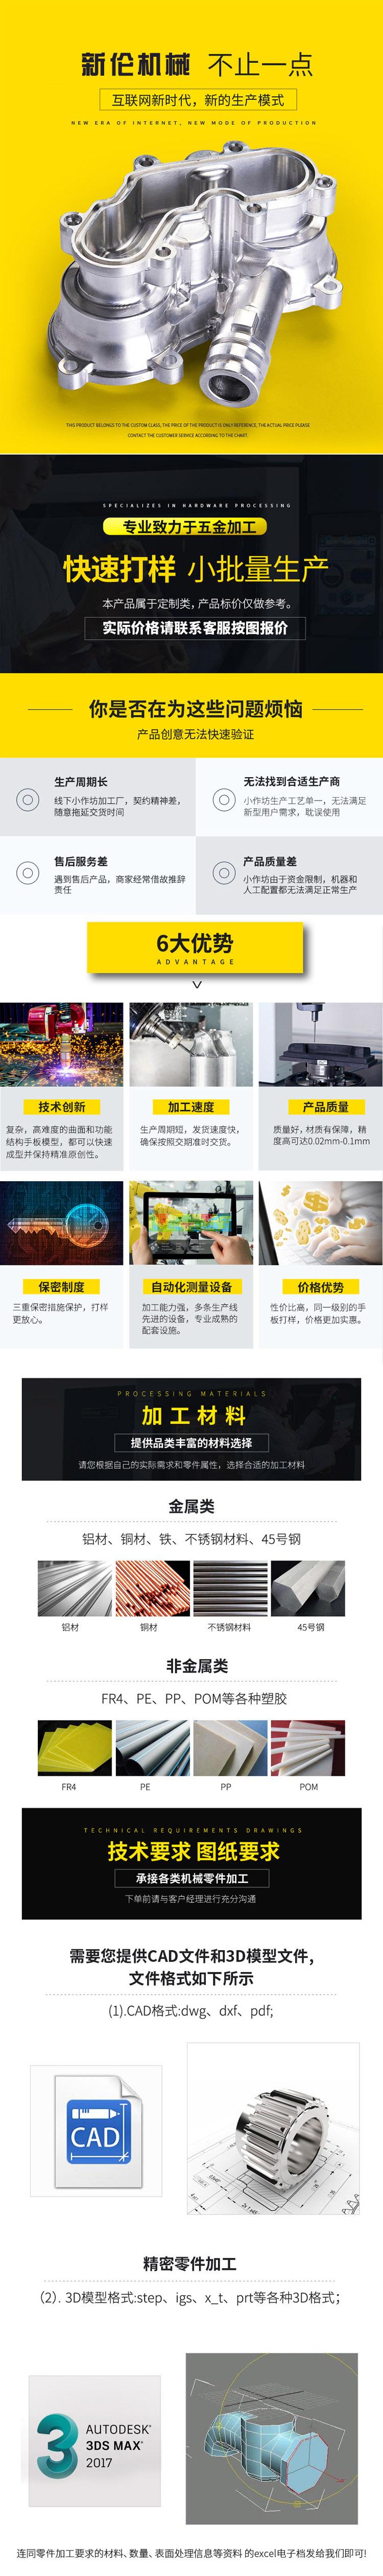 CNC龙8国际手机游戏官网龙8国际手机游戏官网